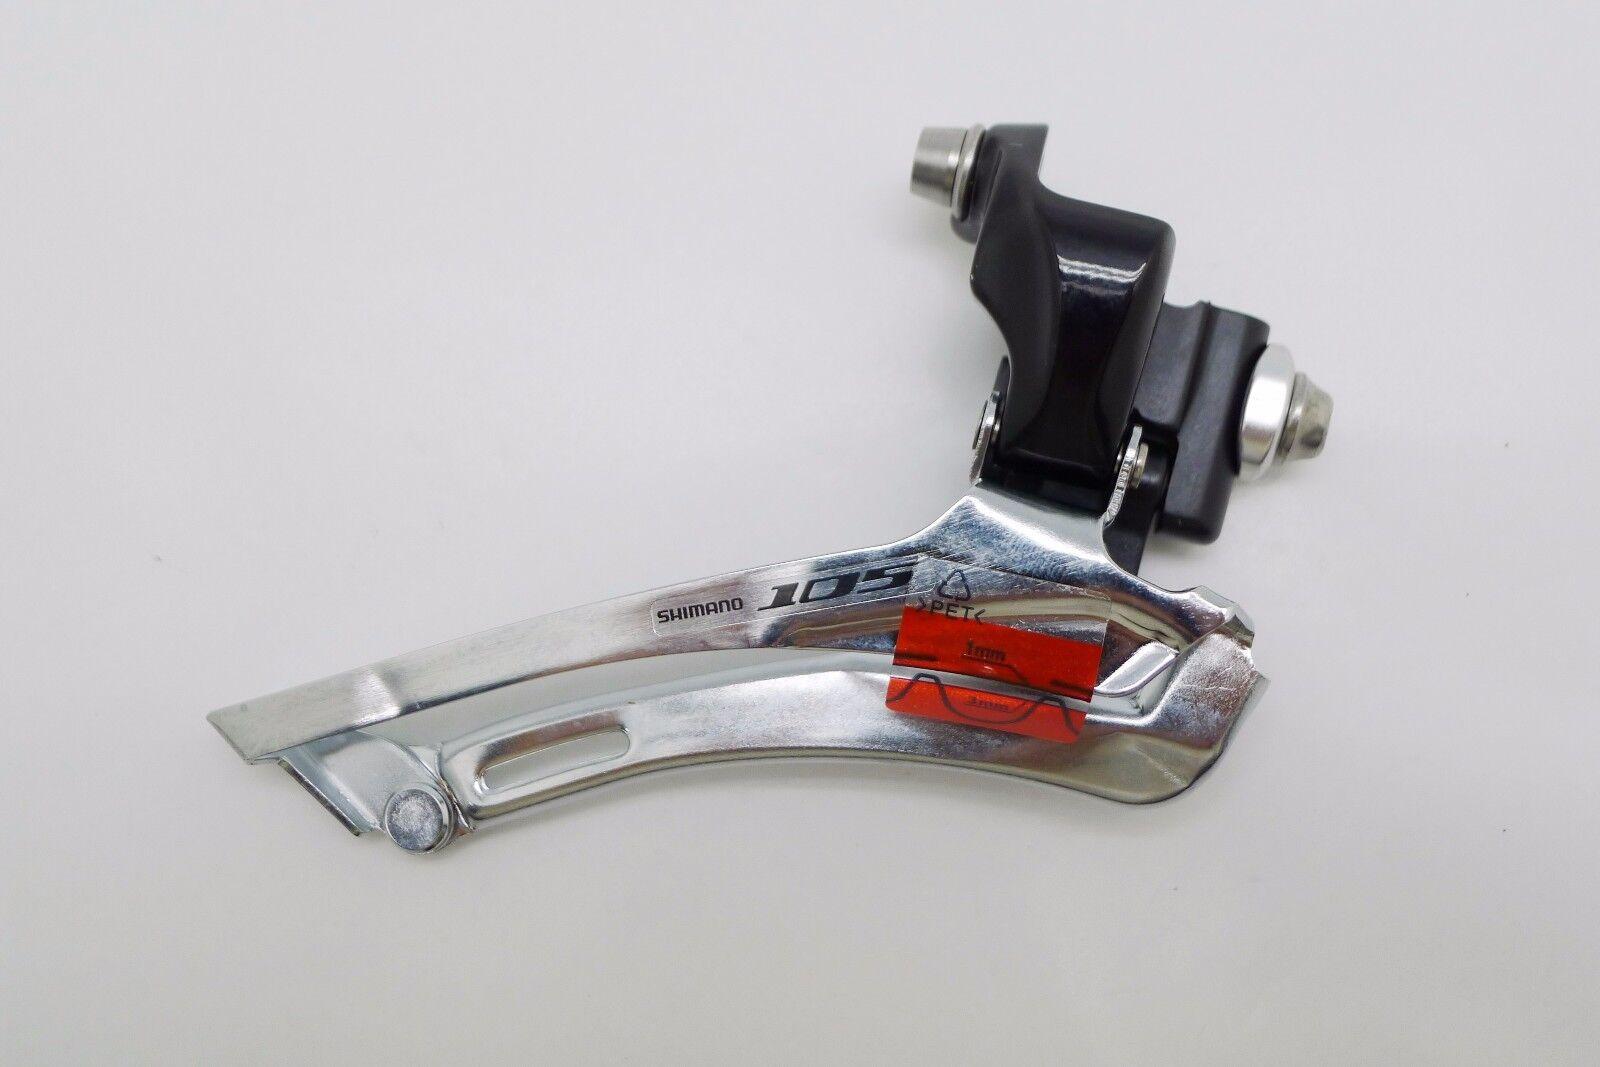 Black Shimano 105 FD-5700 2x10 Speed Braze-On Front Derailleur